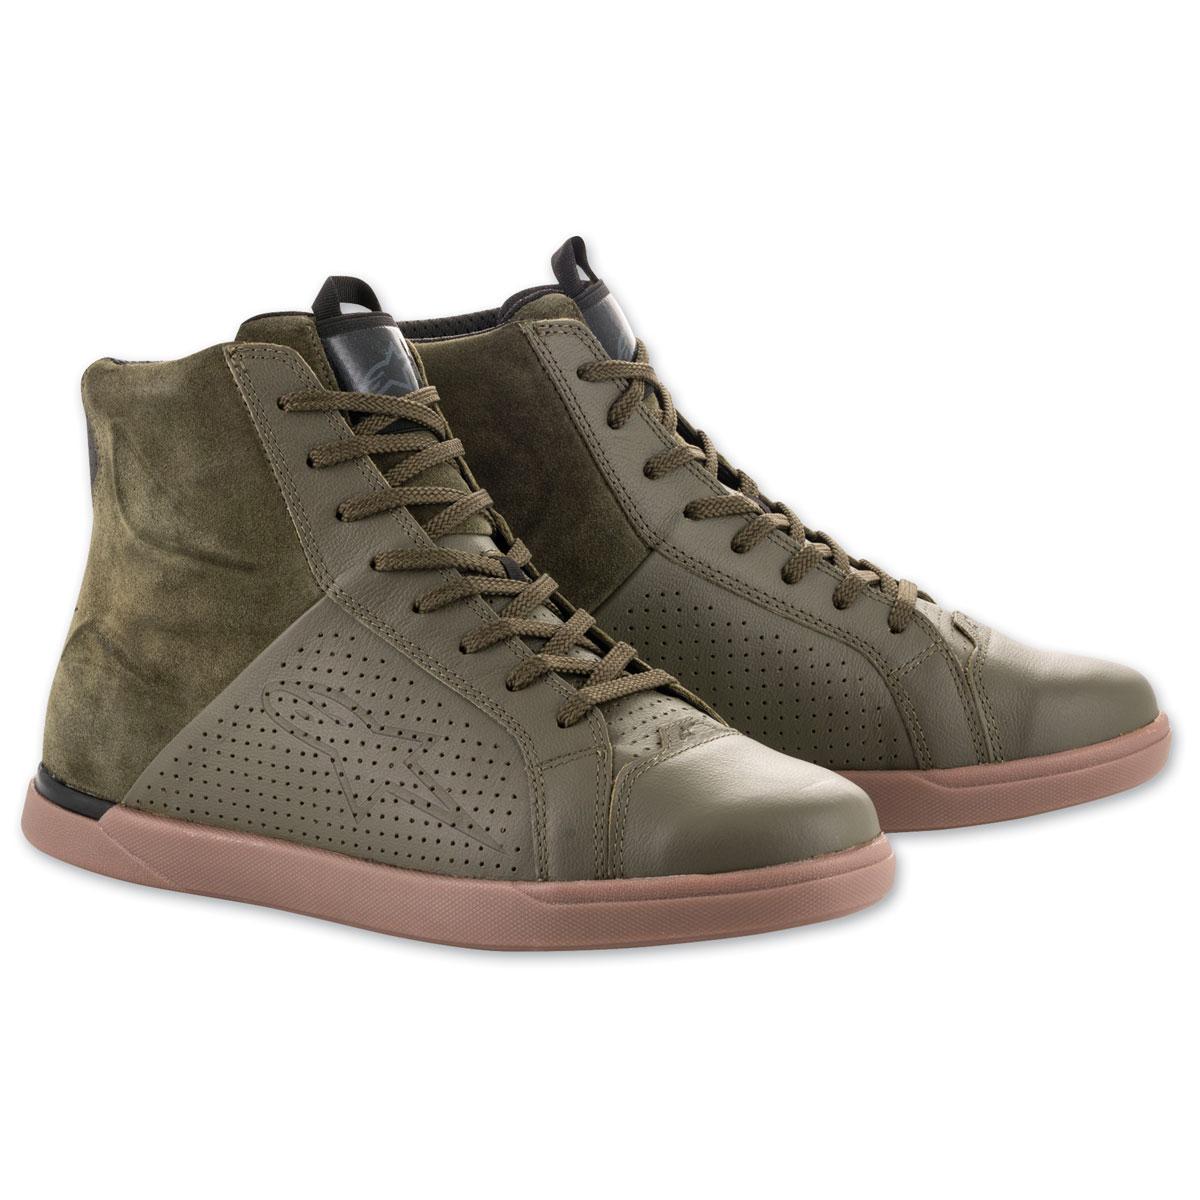 Alpinestars Men's Jam Air Military Green Shoes